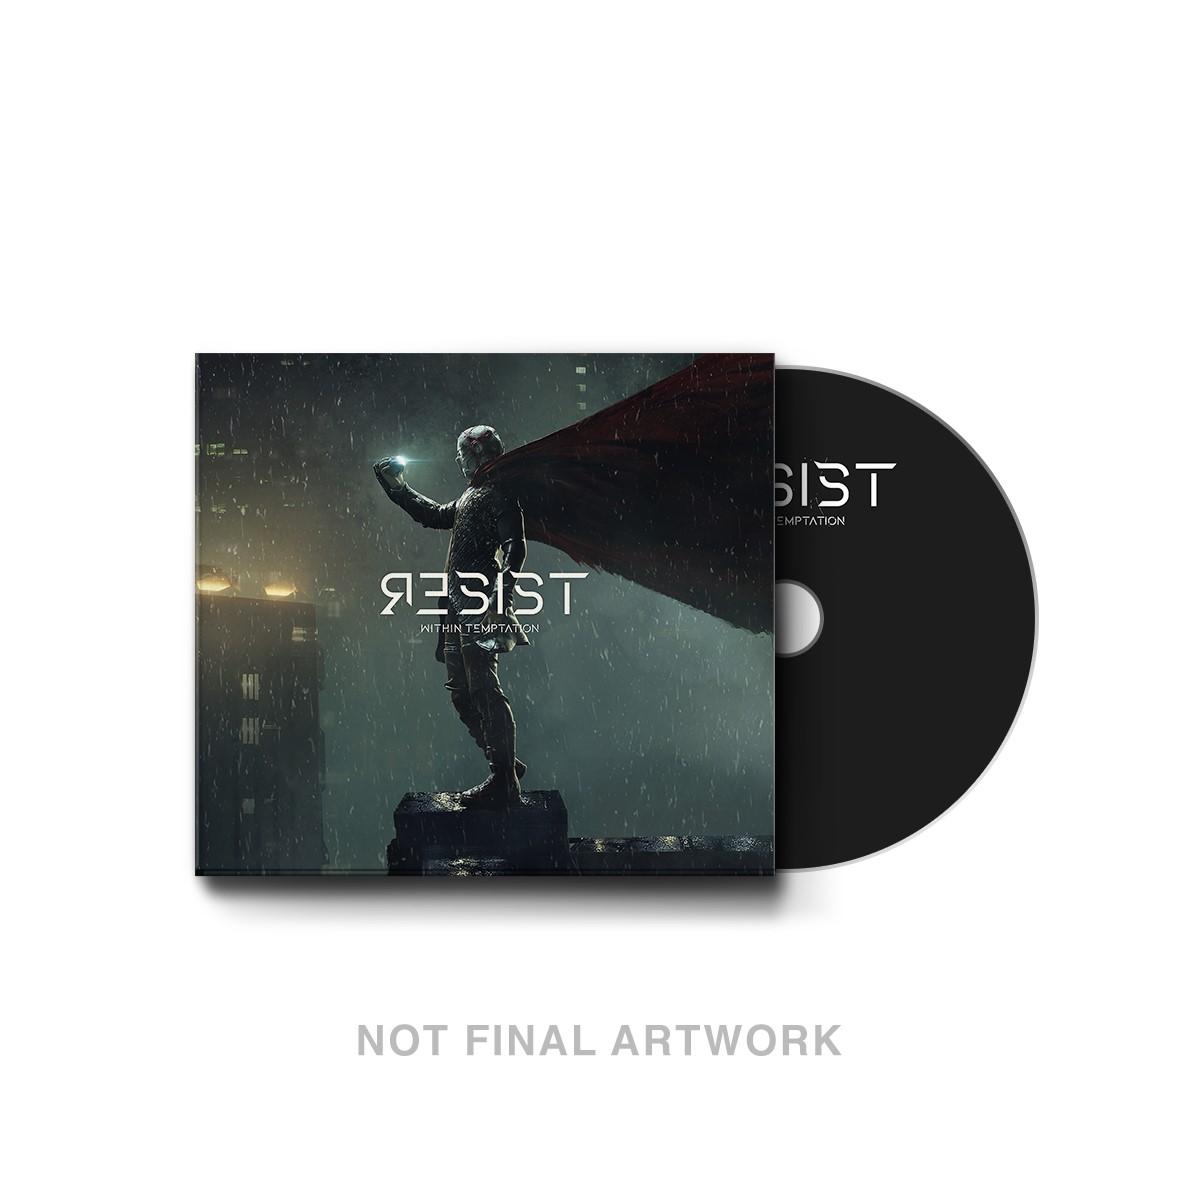 Resist - CD - Within Temptation